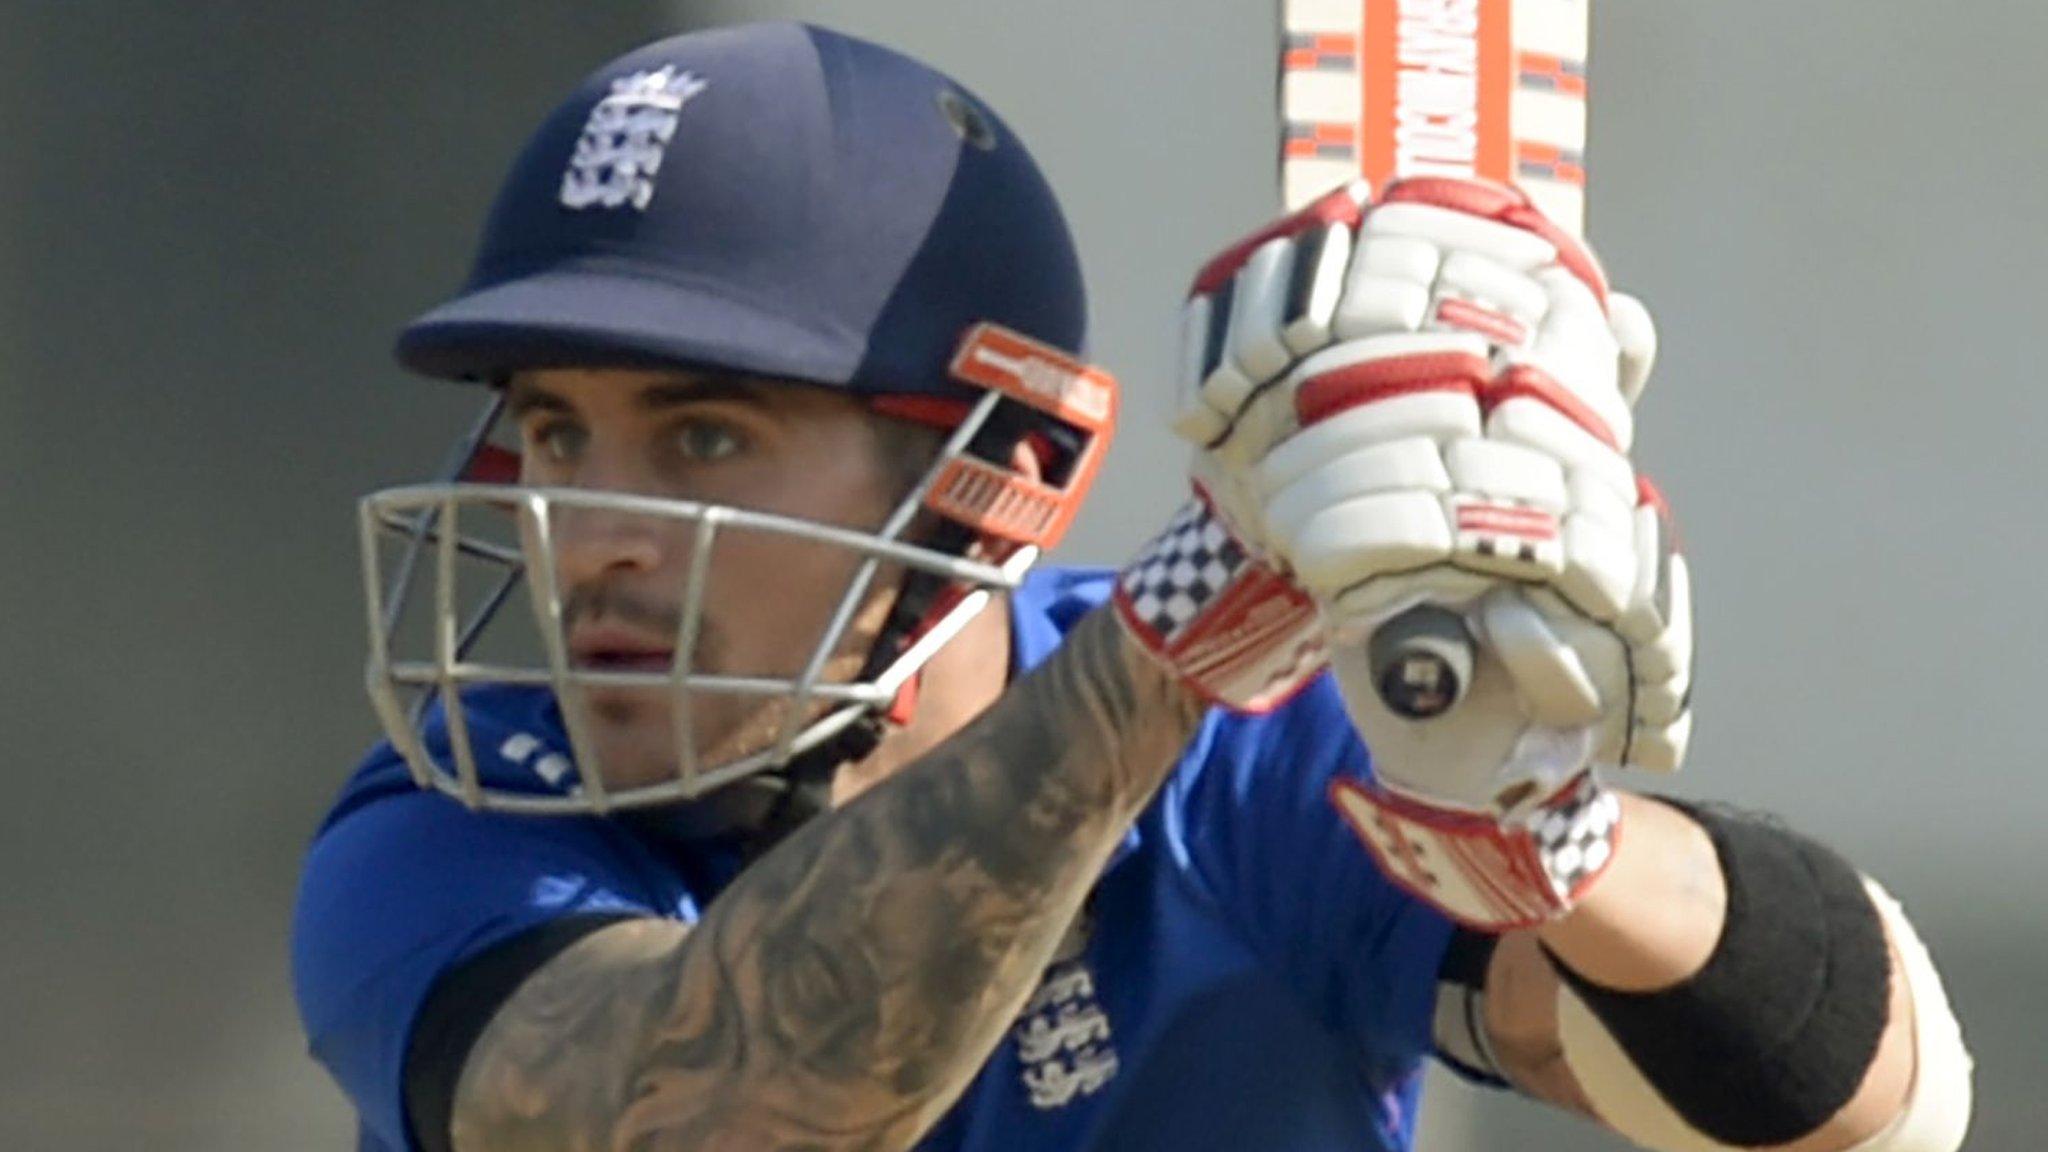 England: Alex Hales to miss rest of India tour through injury